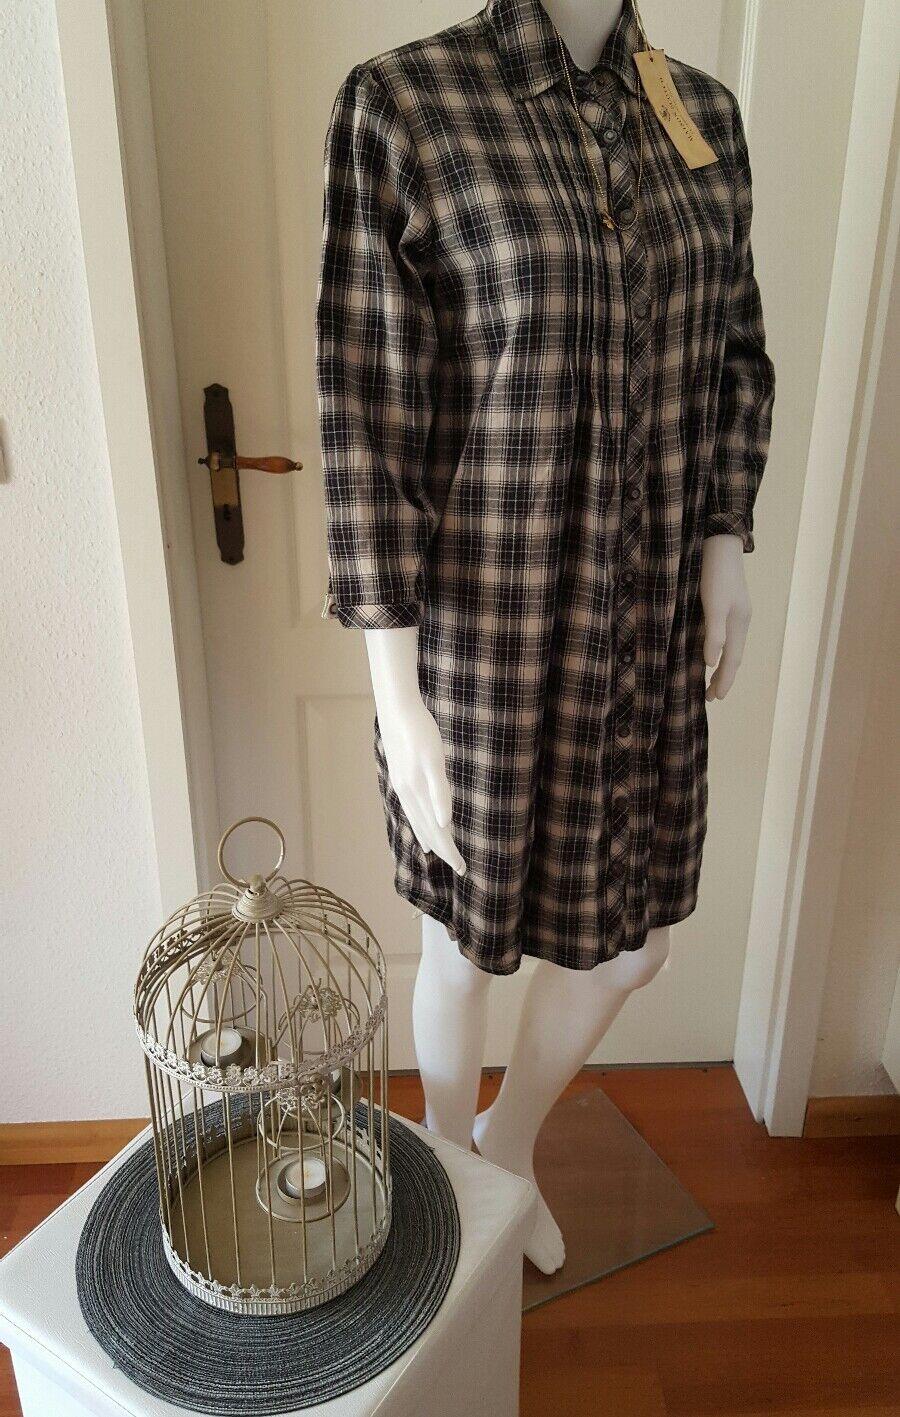 ❤️ Scotch & Soda Pleated Kleid Longshirt Shirt Blause Hemd kariert Gr. S ❤️ NEU